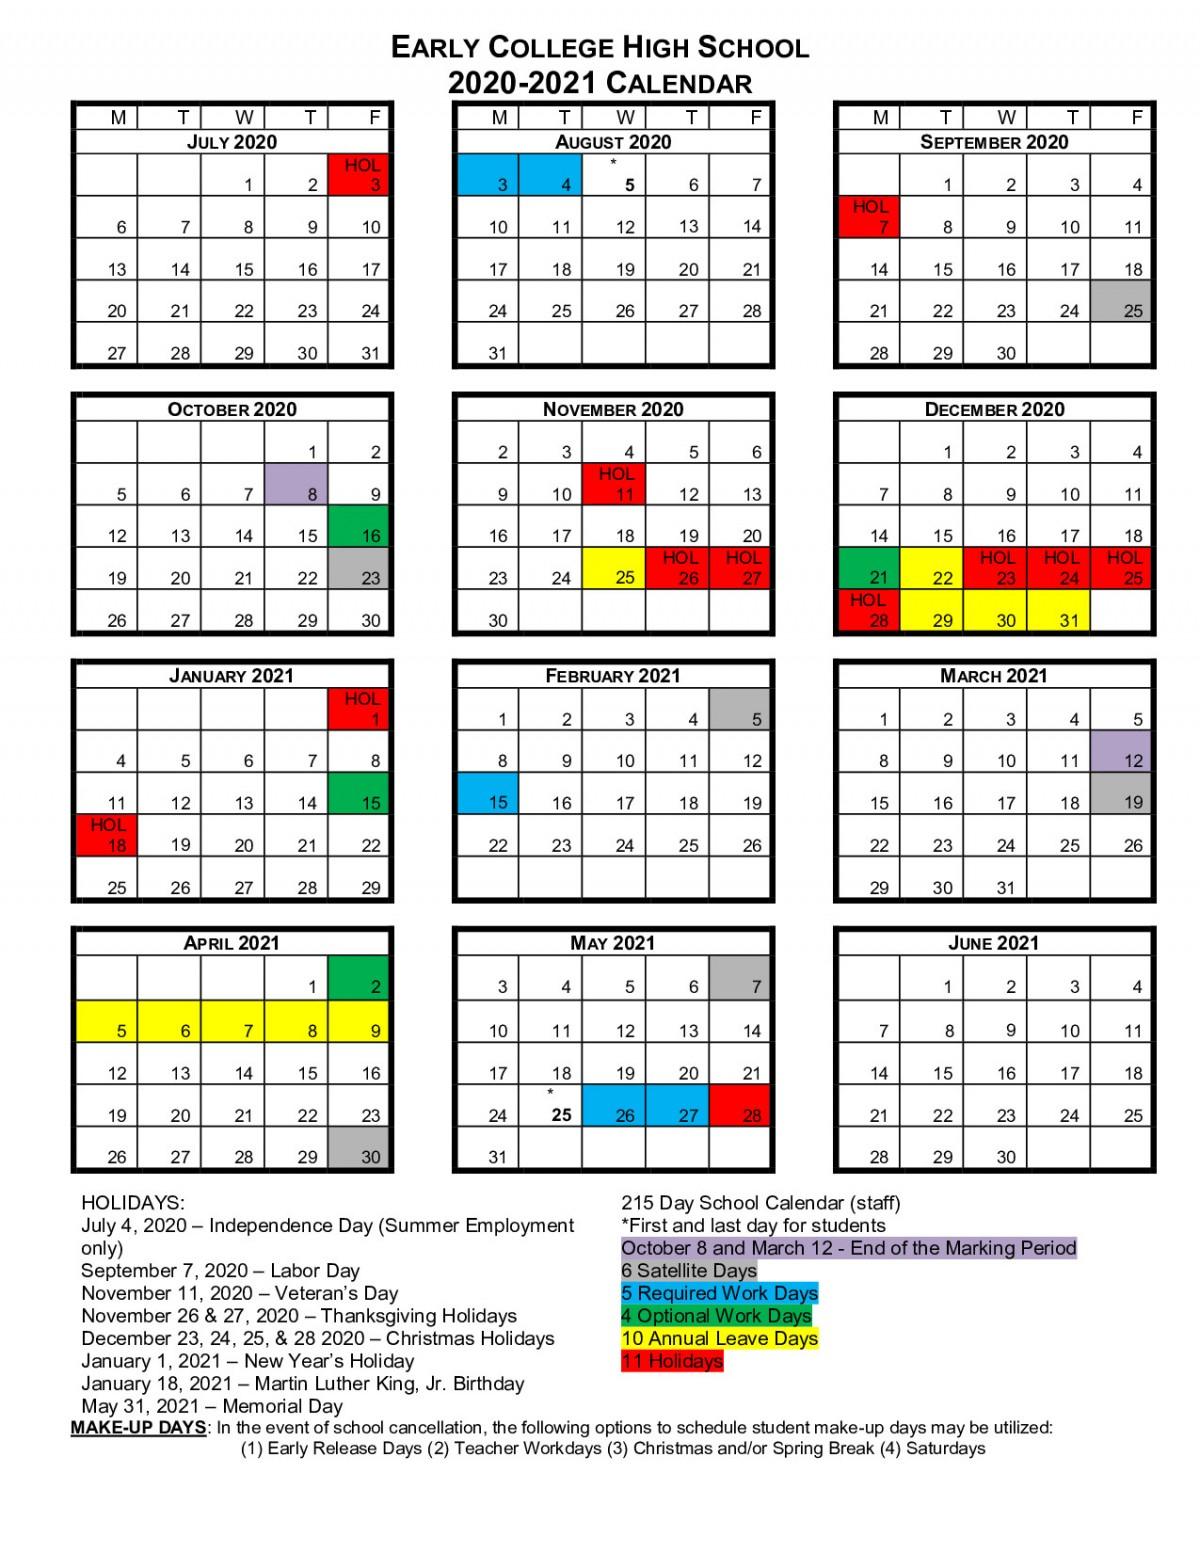 Bcs School Calendars   Beaufort County Schools With Regard To Houston County Board Of Education Calendar